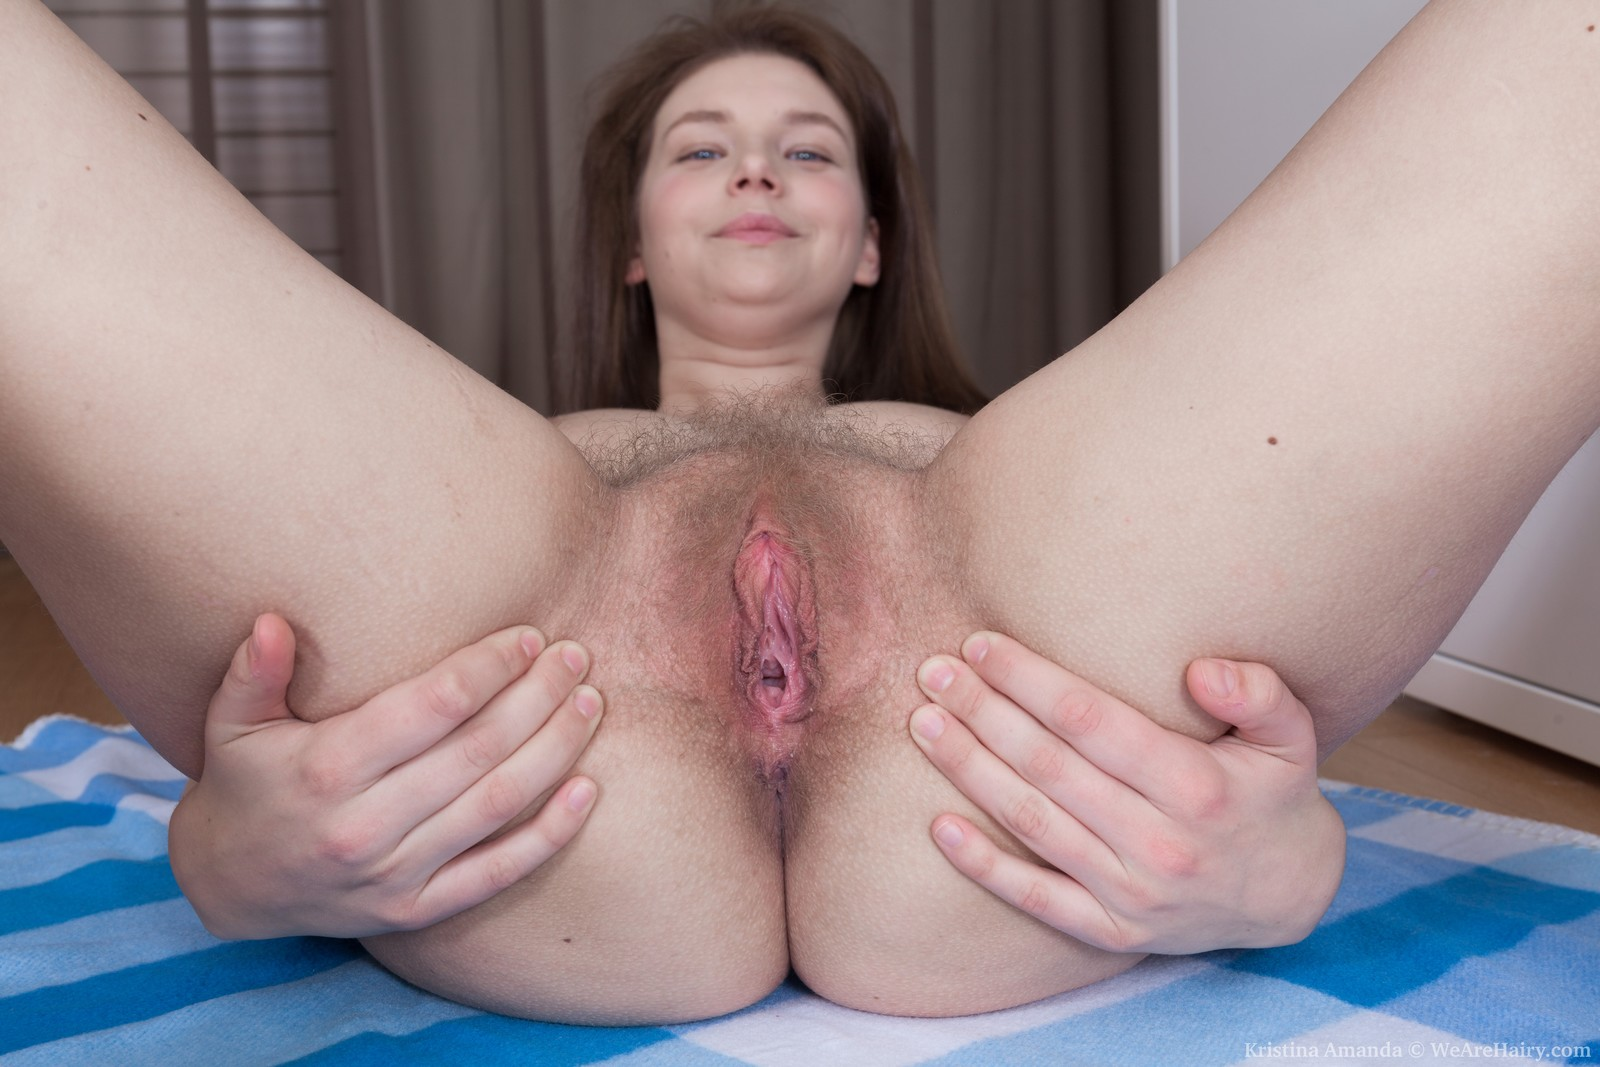 kristina-amanda-gets-naked-after-some-cleaning7.jpg